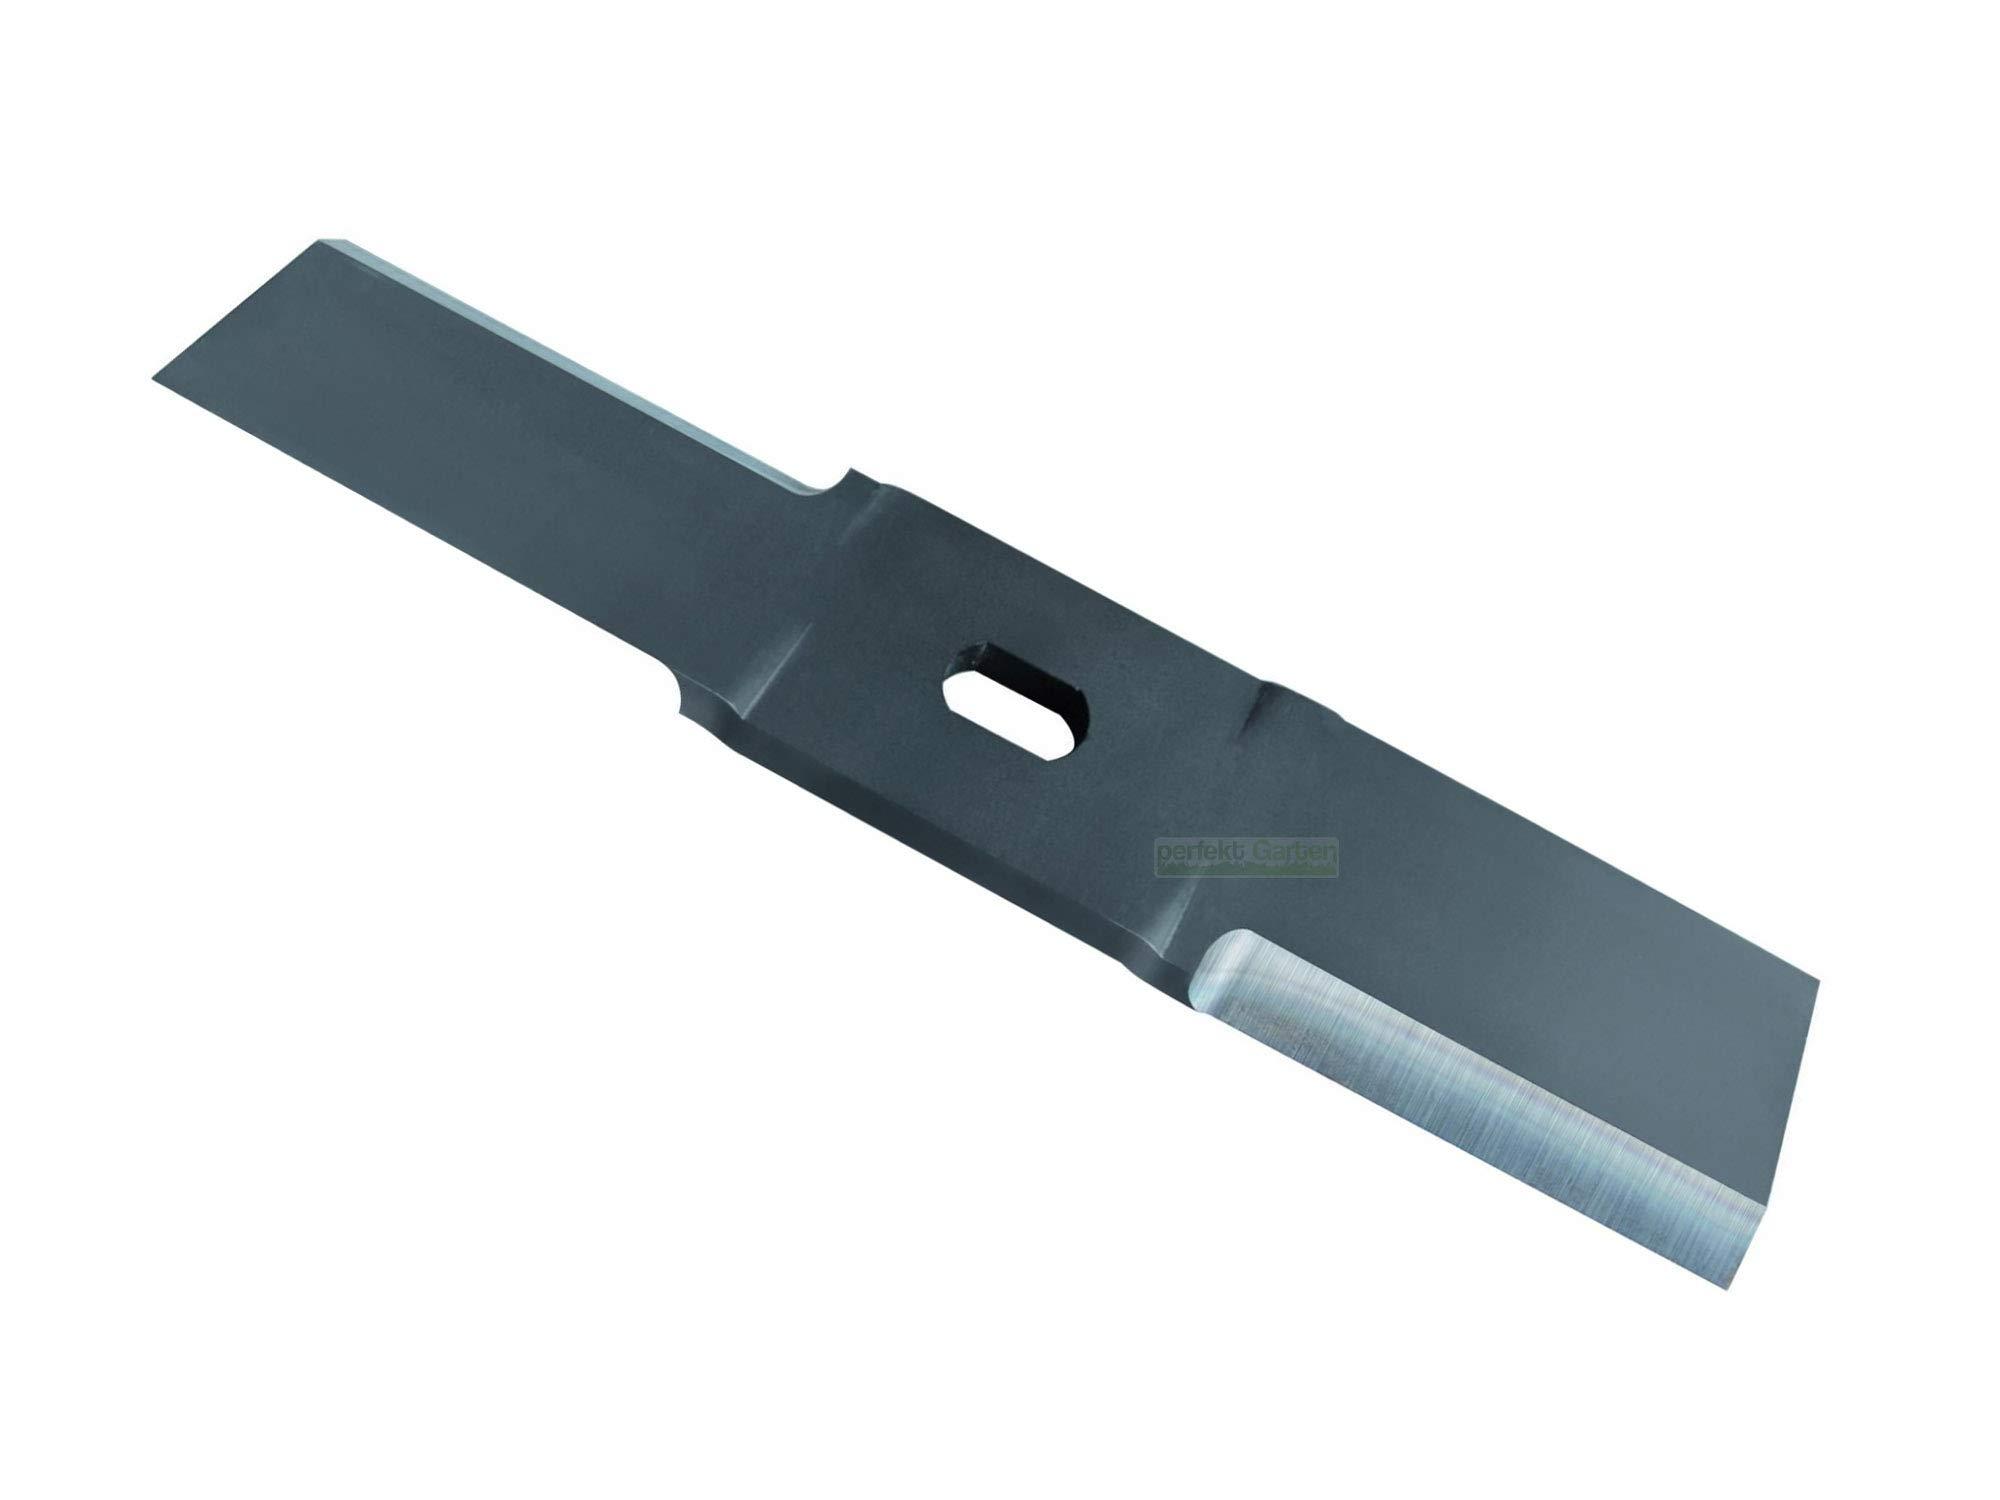 195-CM-Messer-fr-BOSCH-AXT-Rapid-180-200-2000-2200-Grizzly-Hcksler